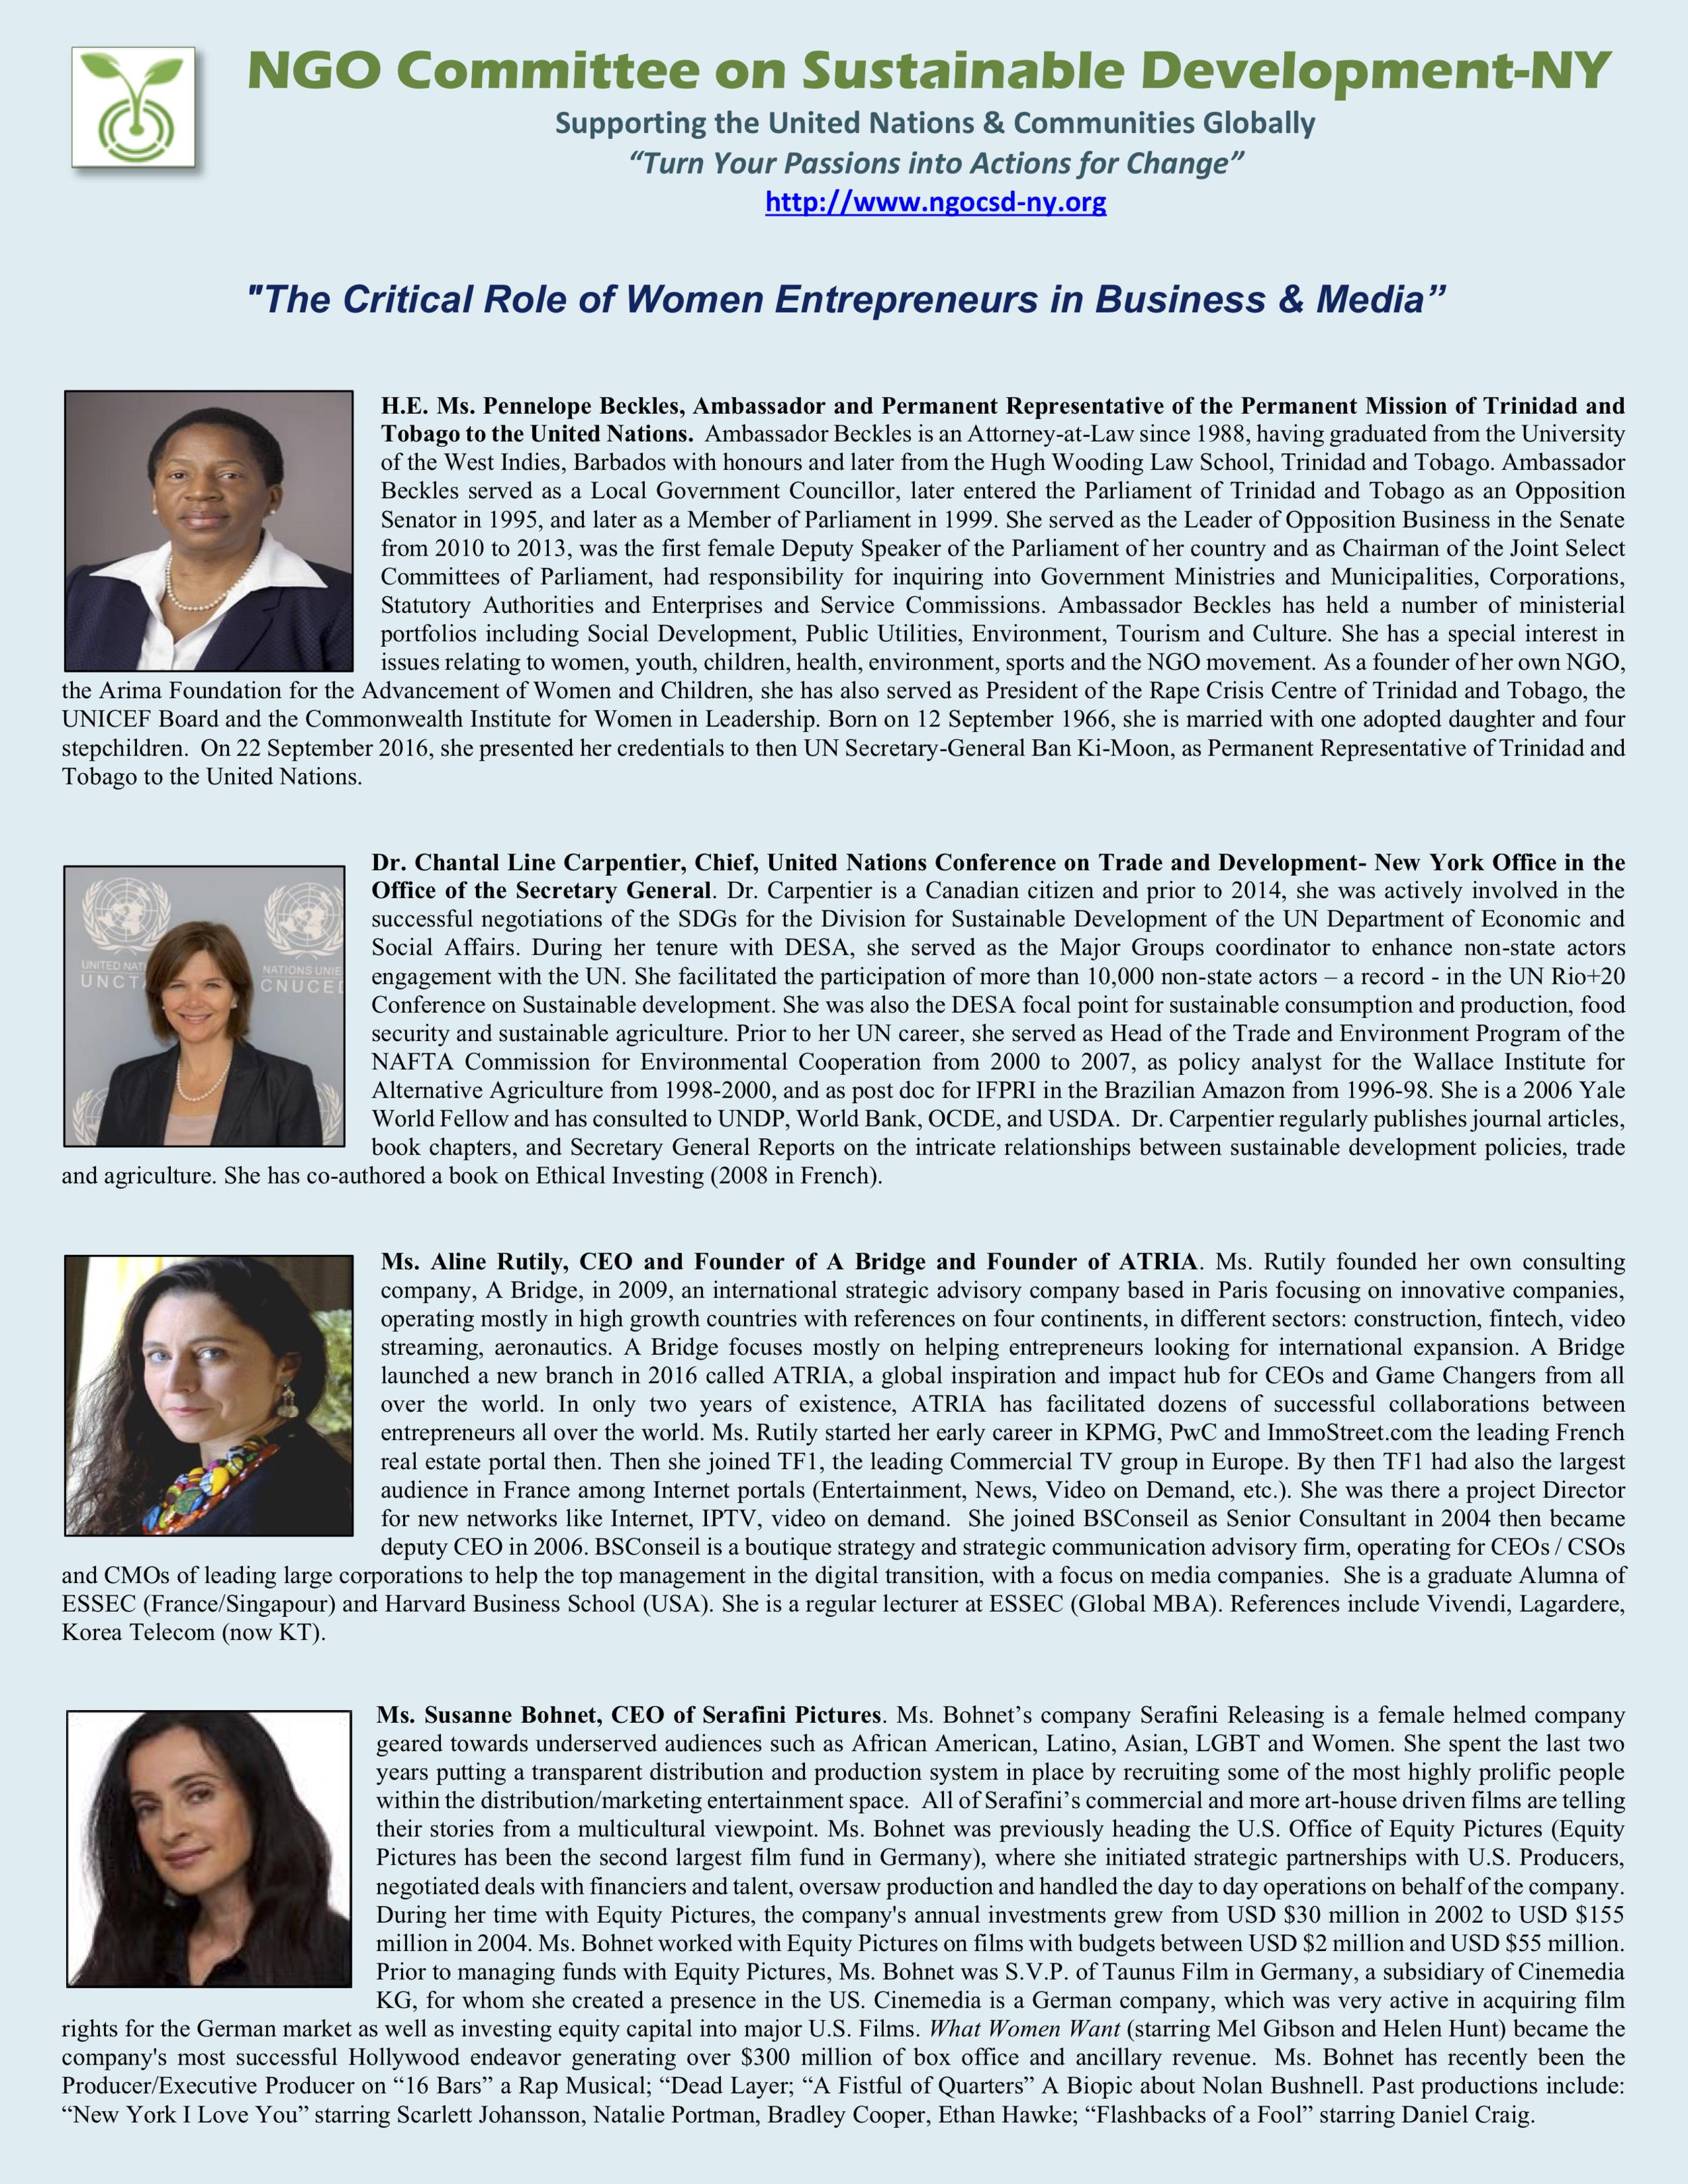 NGOCSD-NY 11-15-18 Women Entrepreneurs Series Photo Bios B2.png